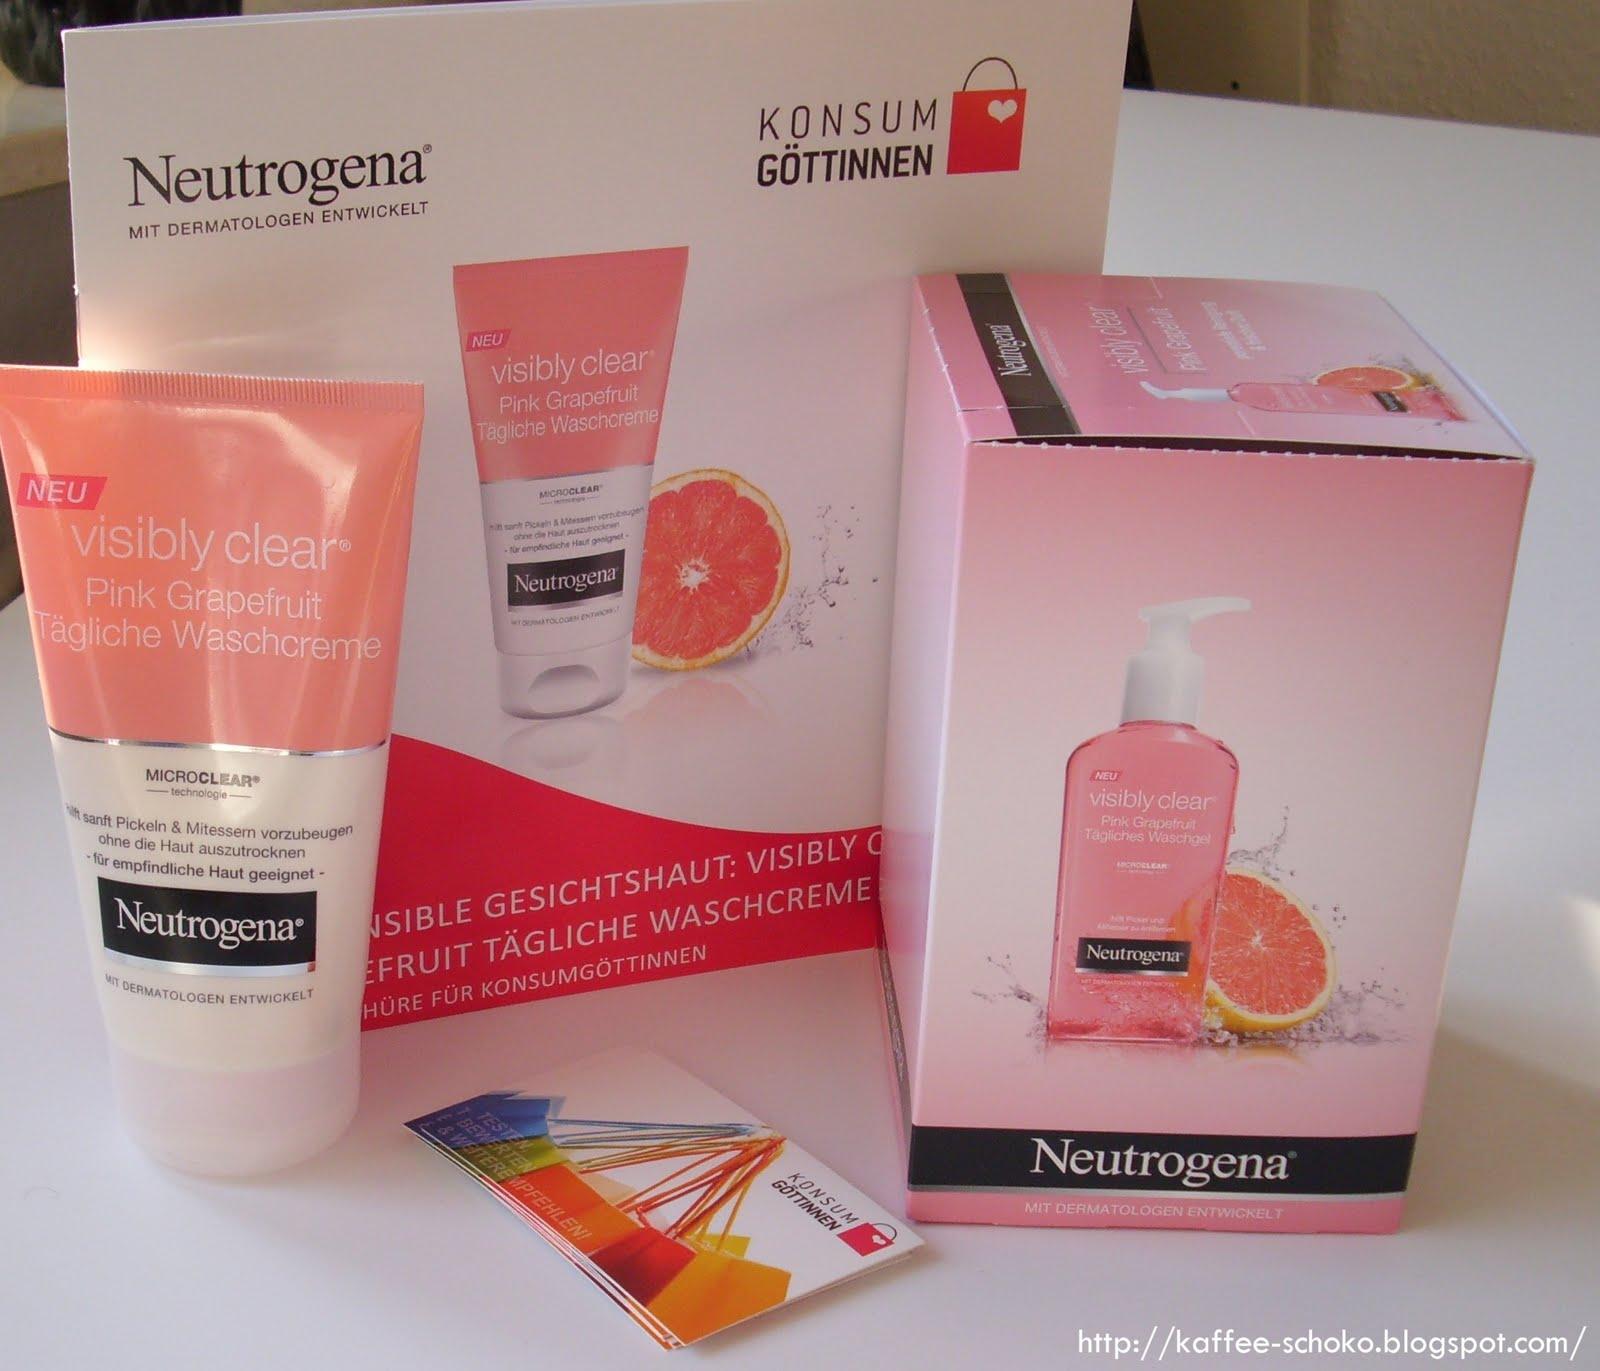 http://3.bp.blogspot.com/--NmcqKtHT88/TacoLRxVoDI/AAAAAAAAAIk/I3DDKR5fvWQ/s1600/neutrogena+pink+grapefruit1.jpg